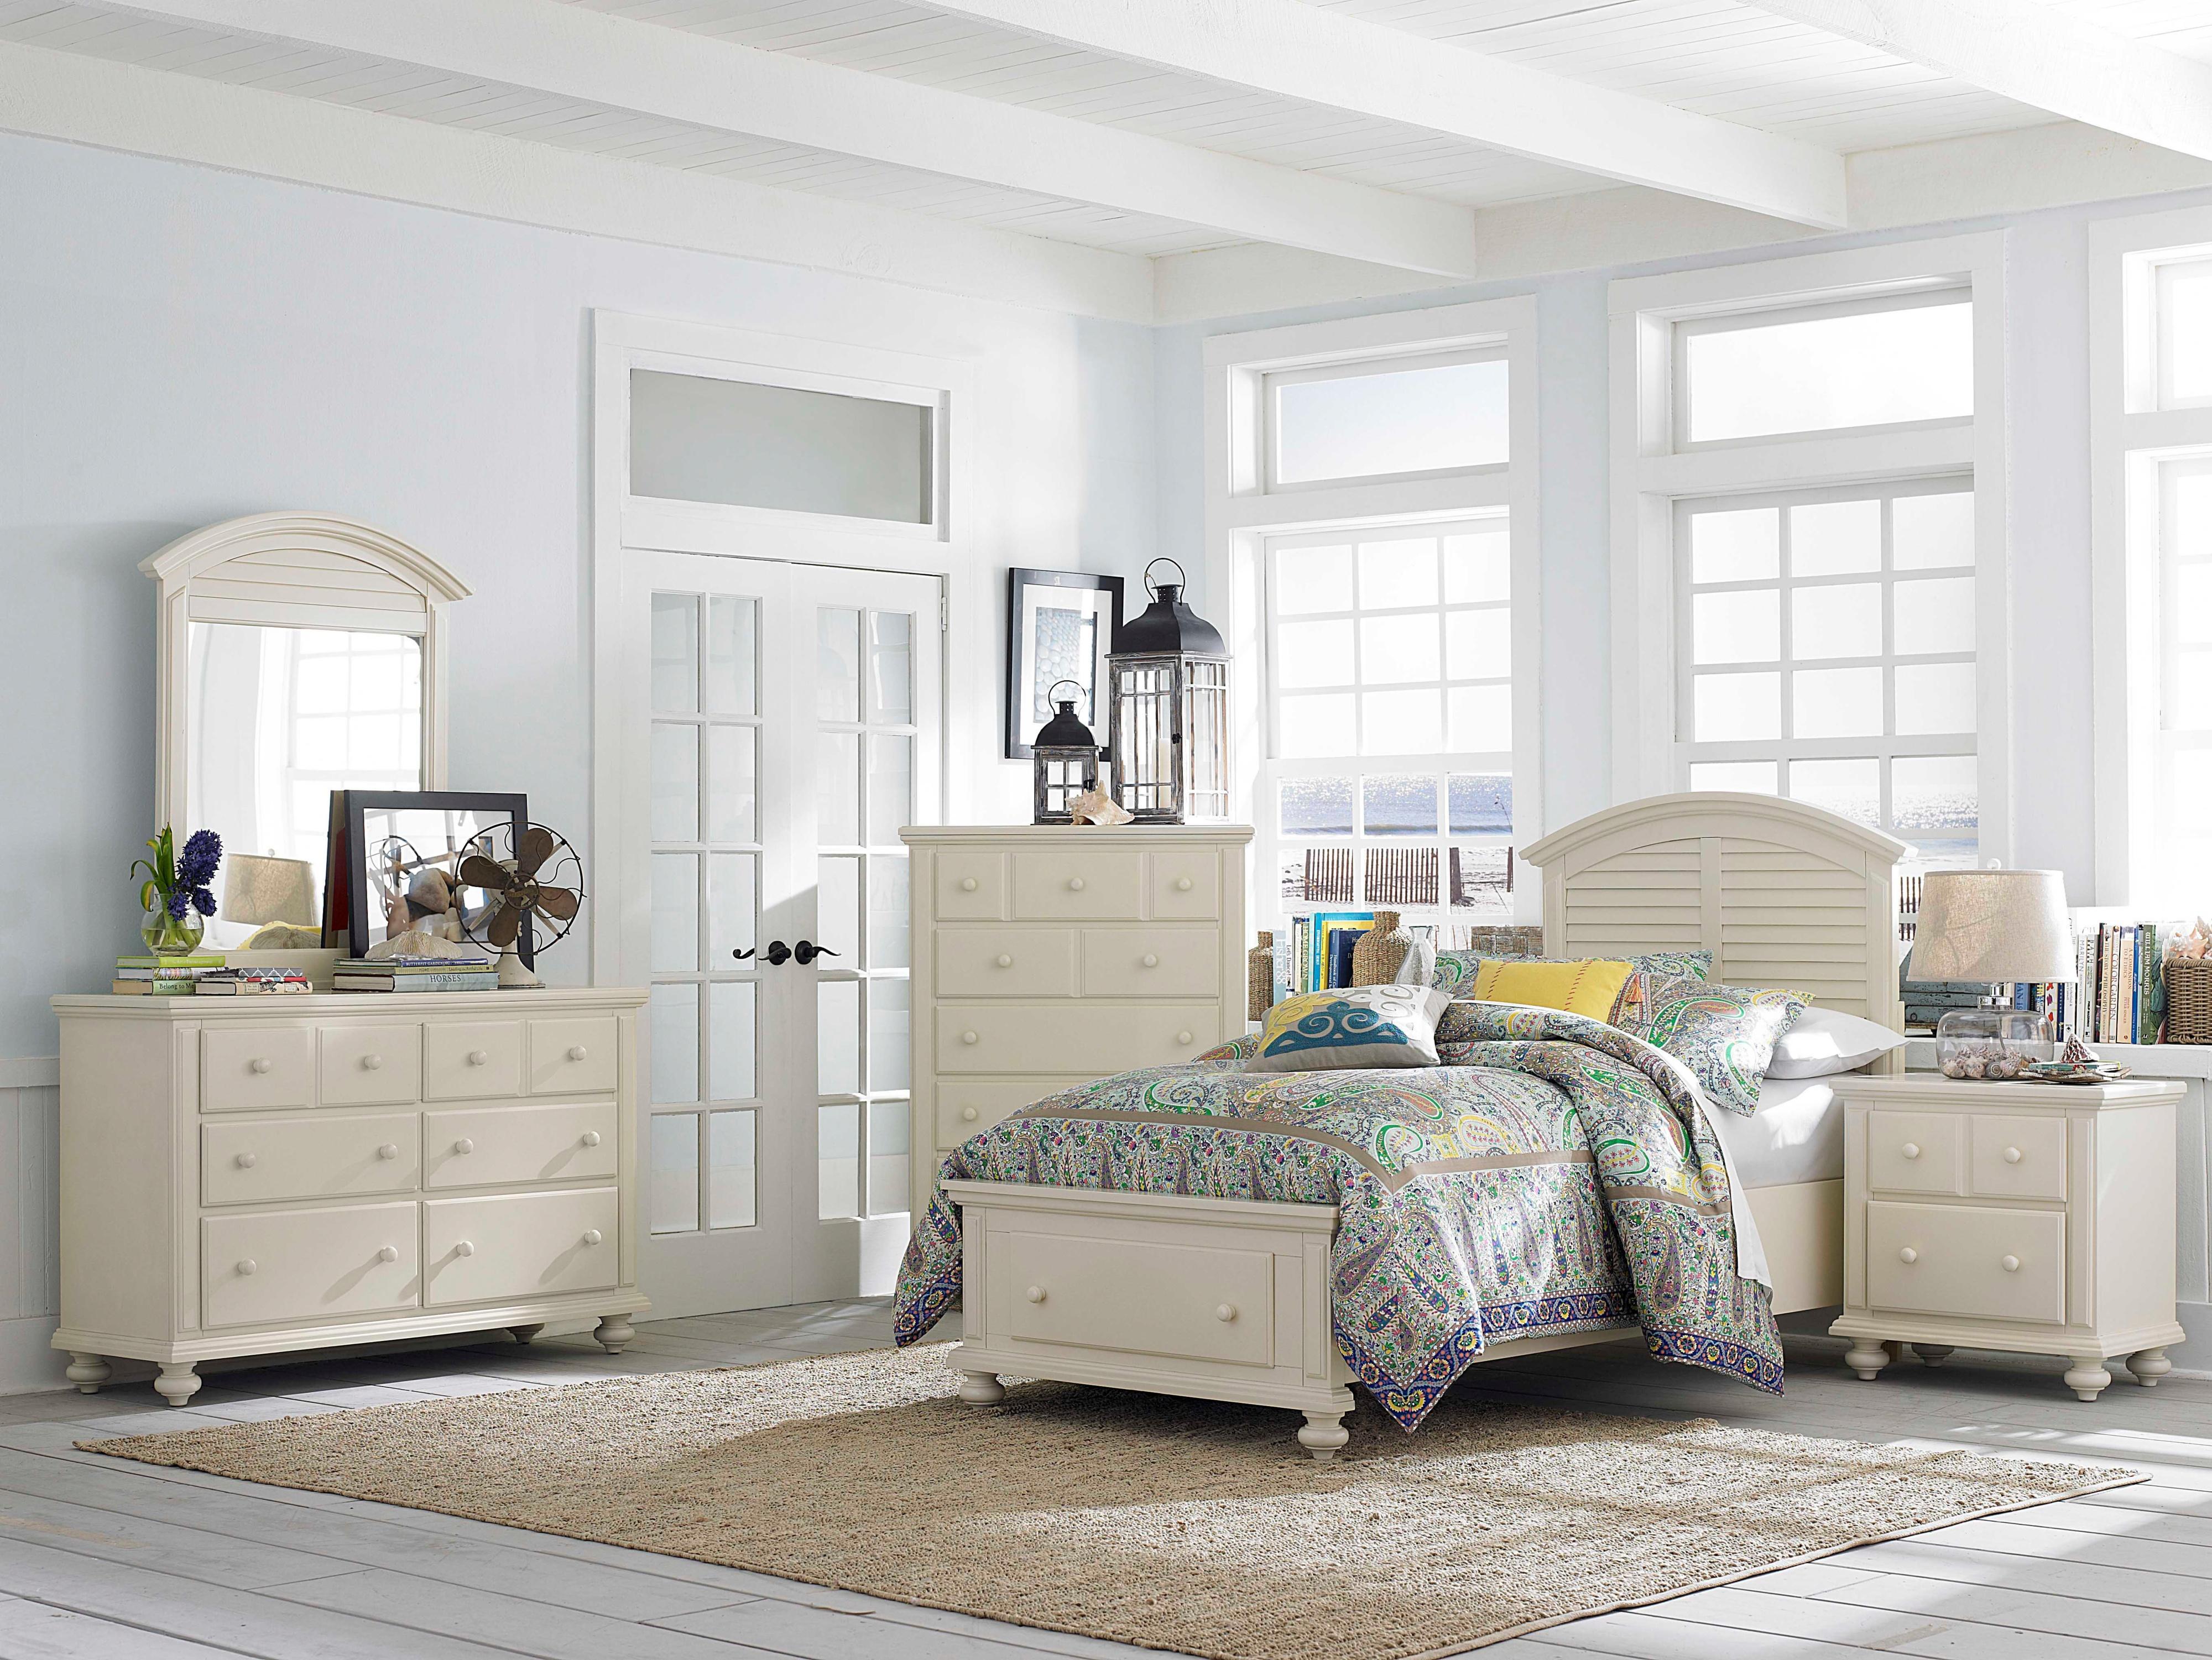 Broyhill Furniture Seabrooke 4471 230 6 Drawer Dresser